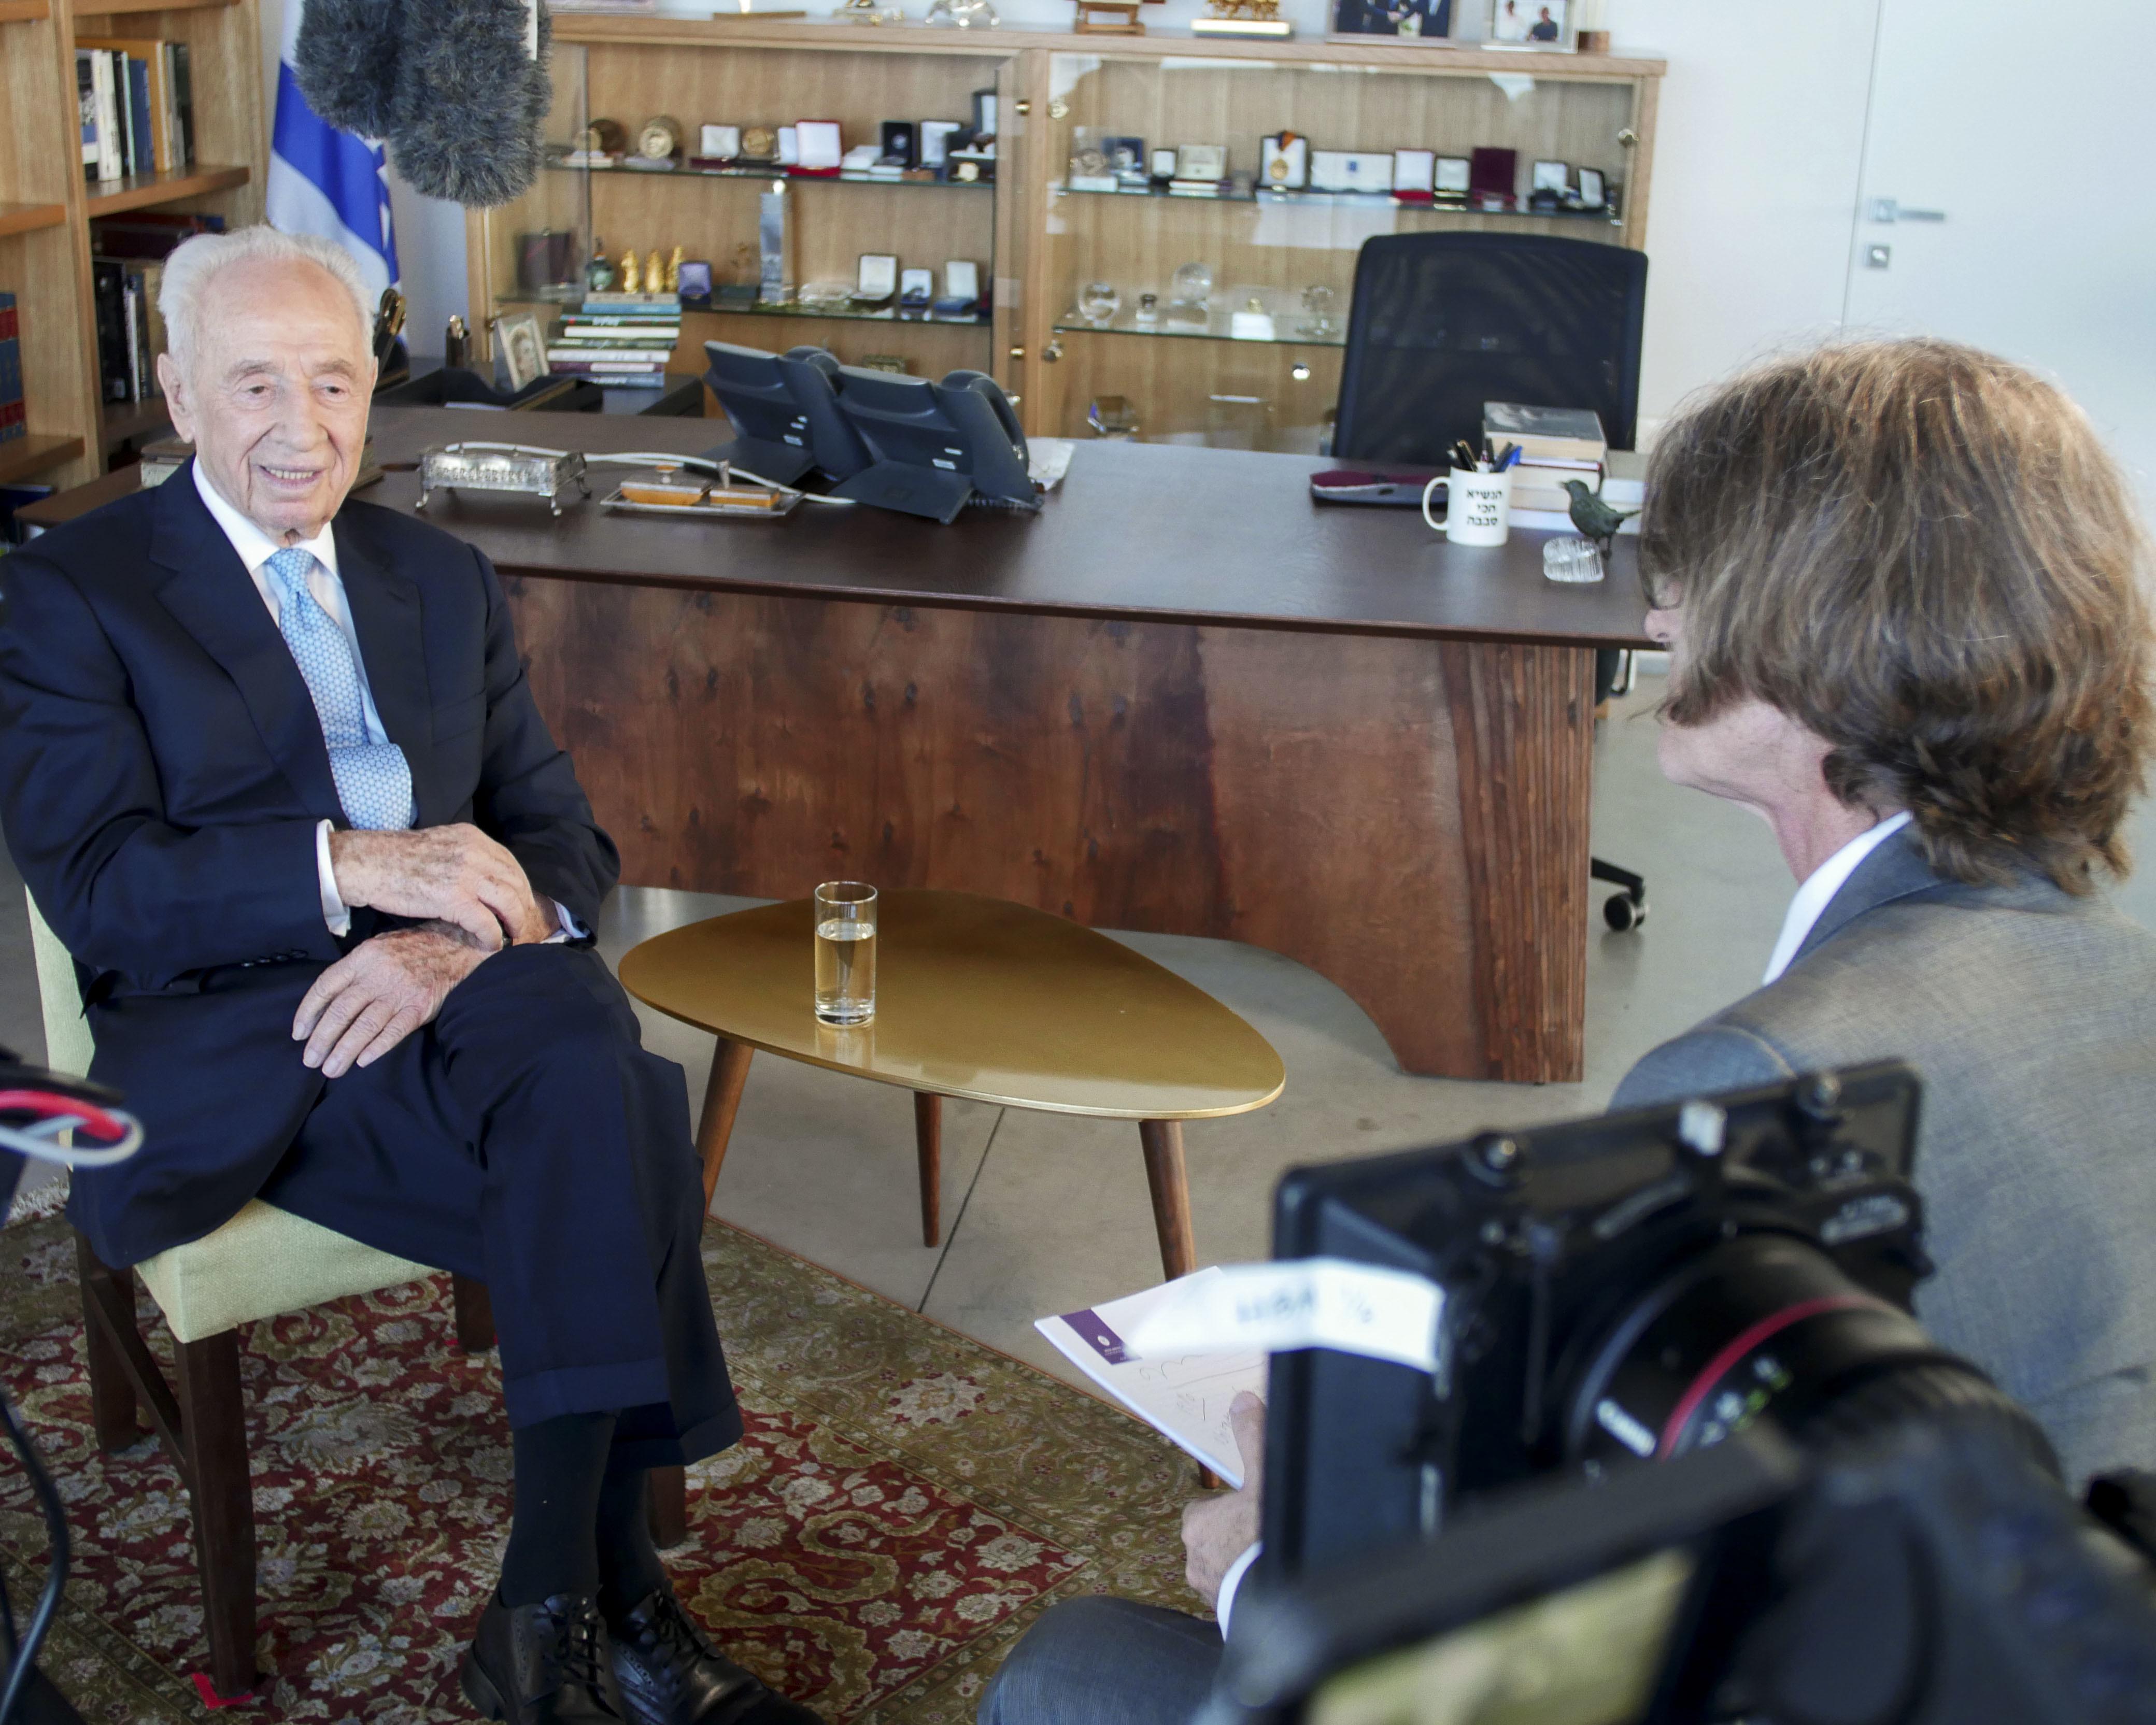 Trank interviews Shimon Peres about David-Ben Gurion in 2016 (credit: Moriah Films)